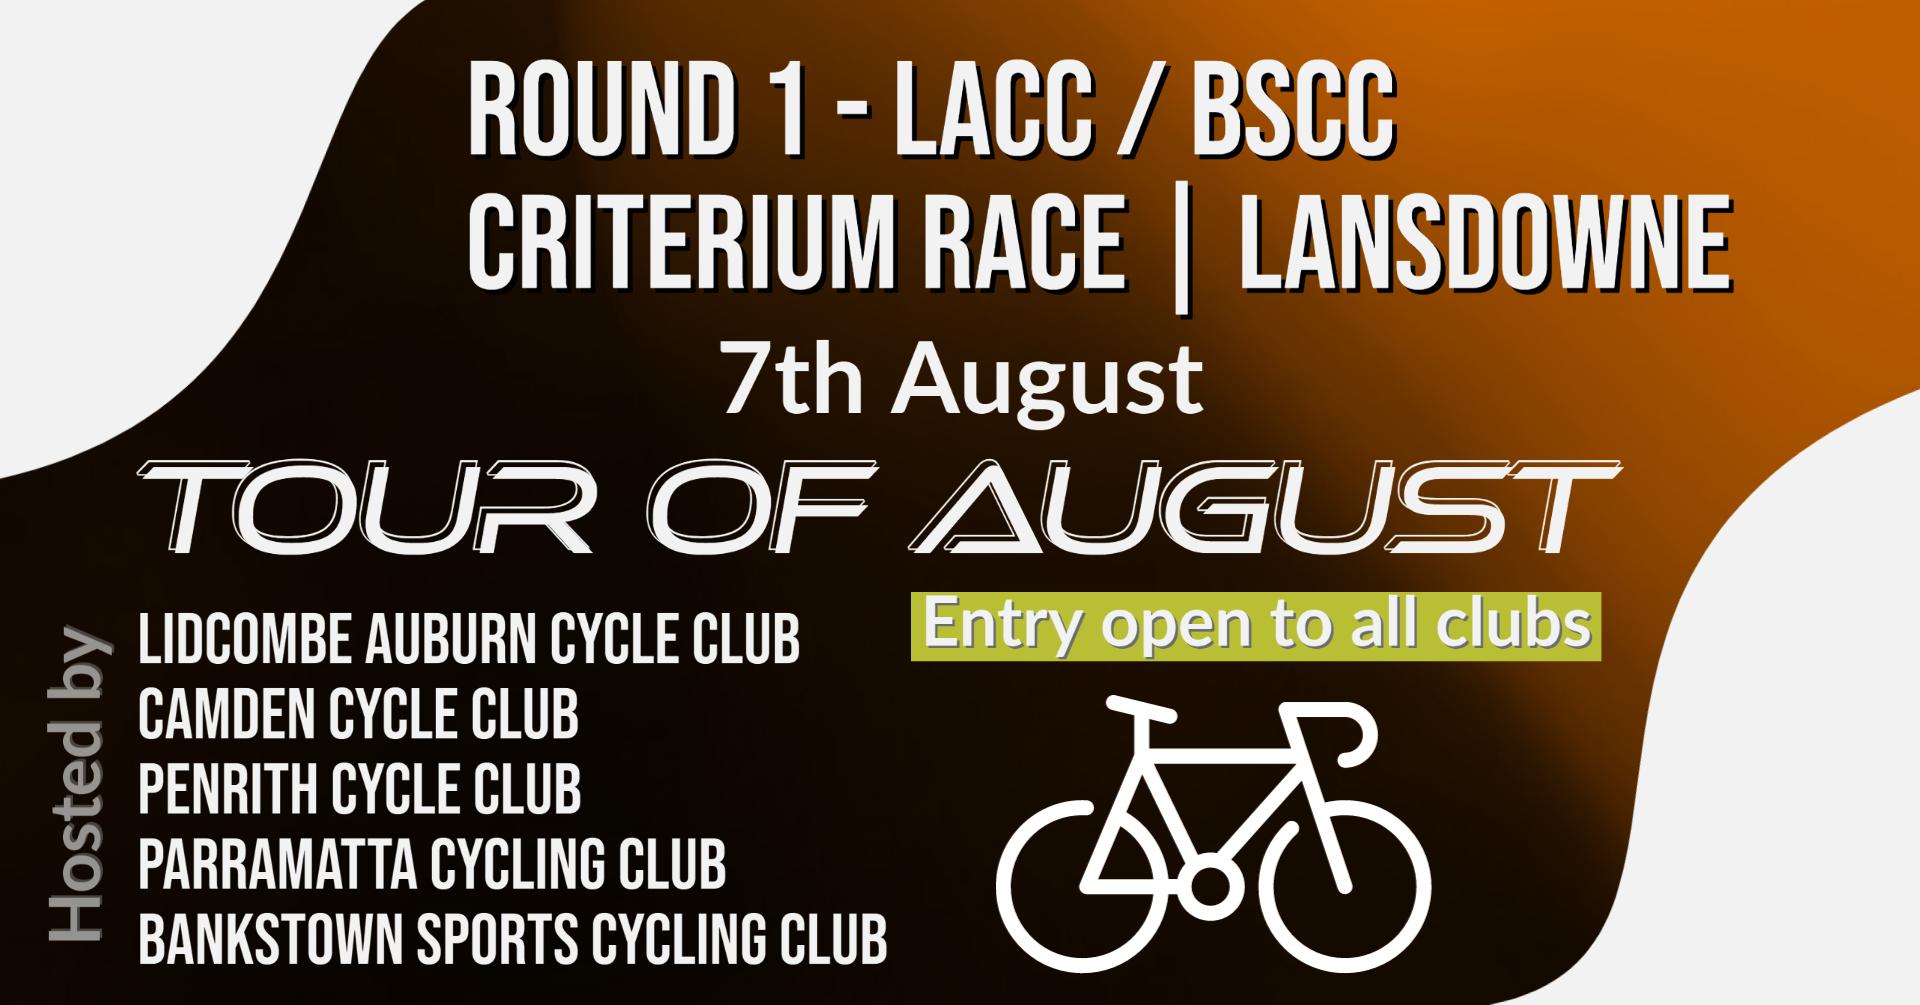 Tour of August round 1 lansdowne